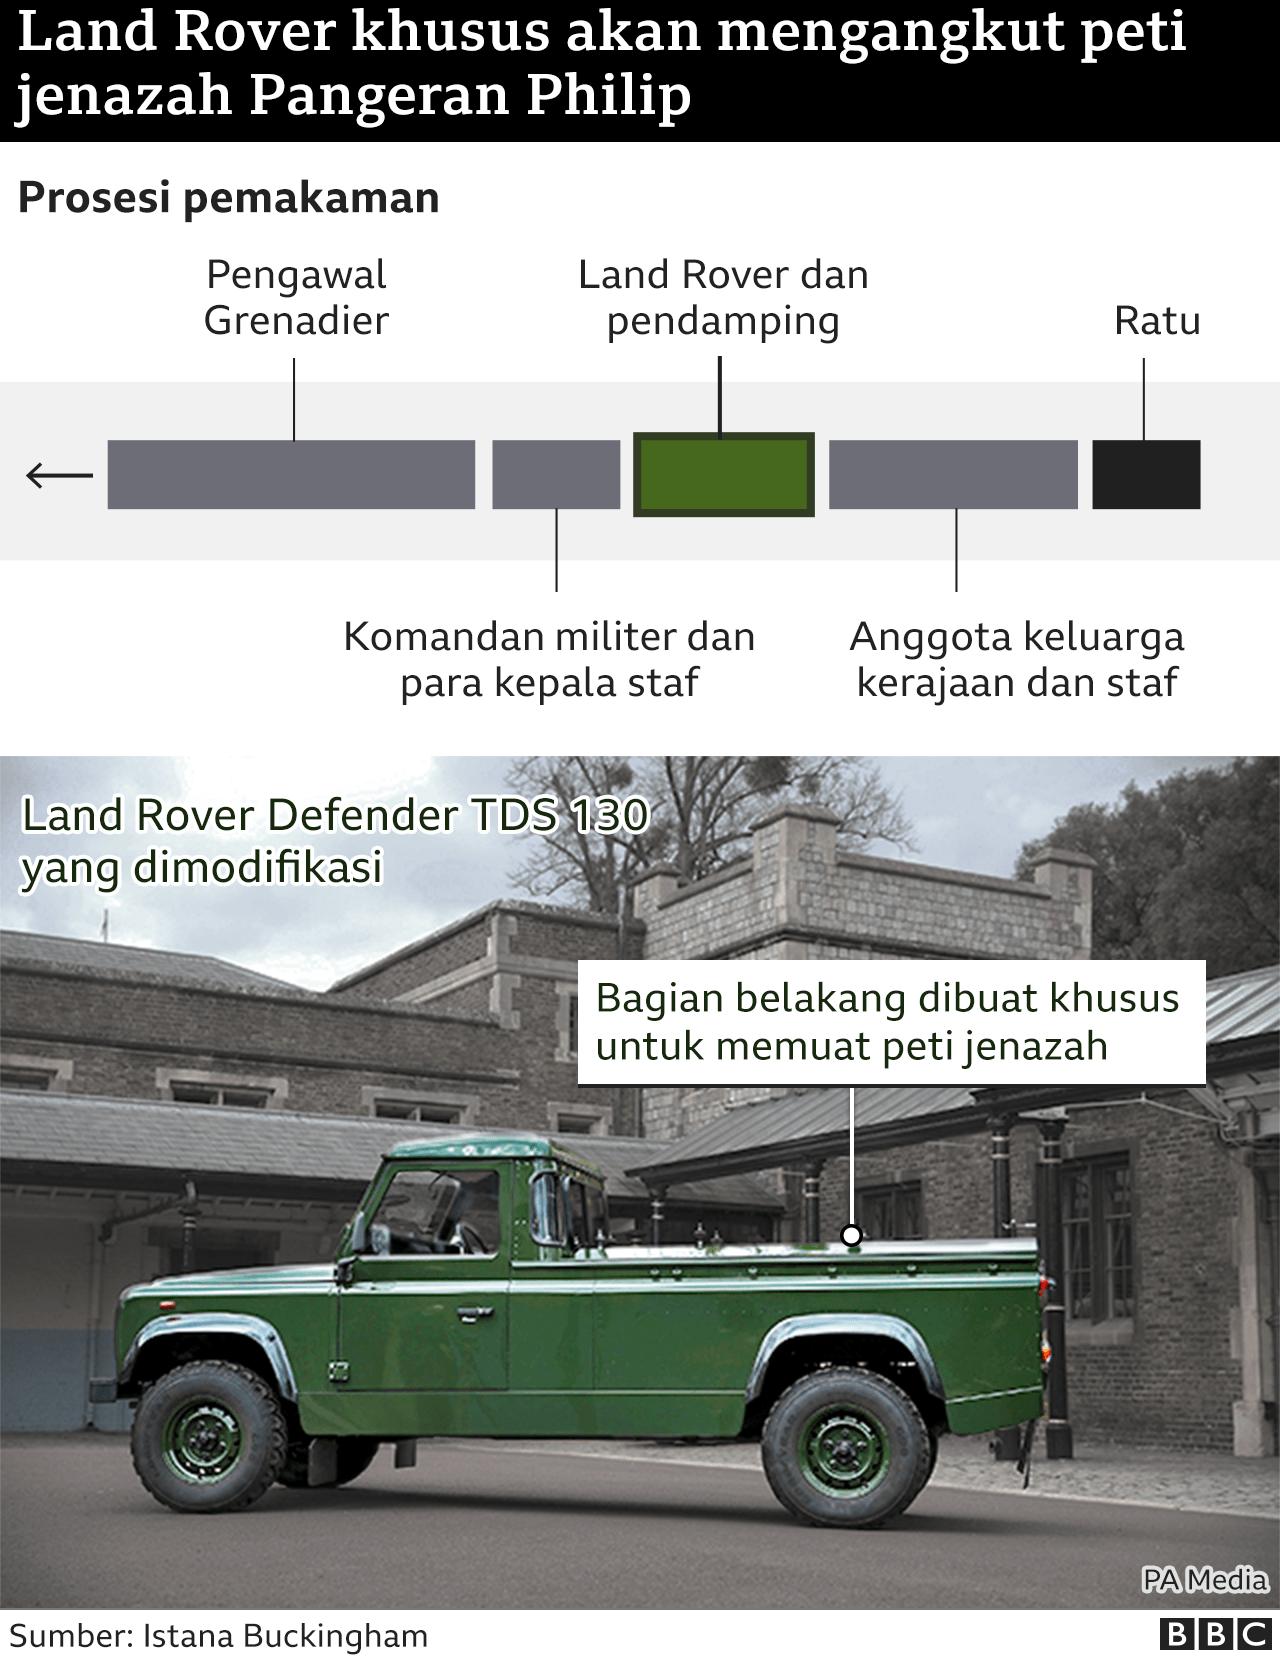 Land Rover pengangkut jenazah Pangeran Philip